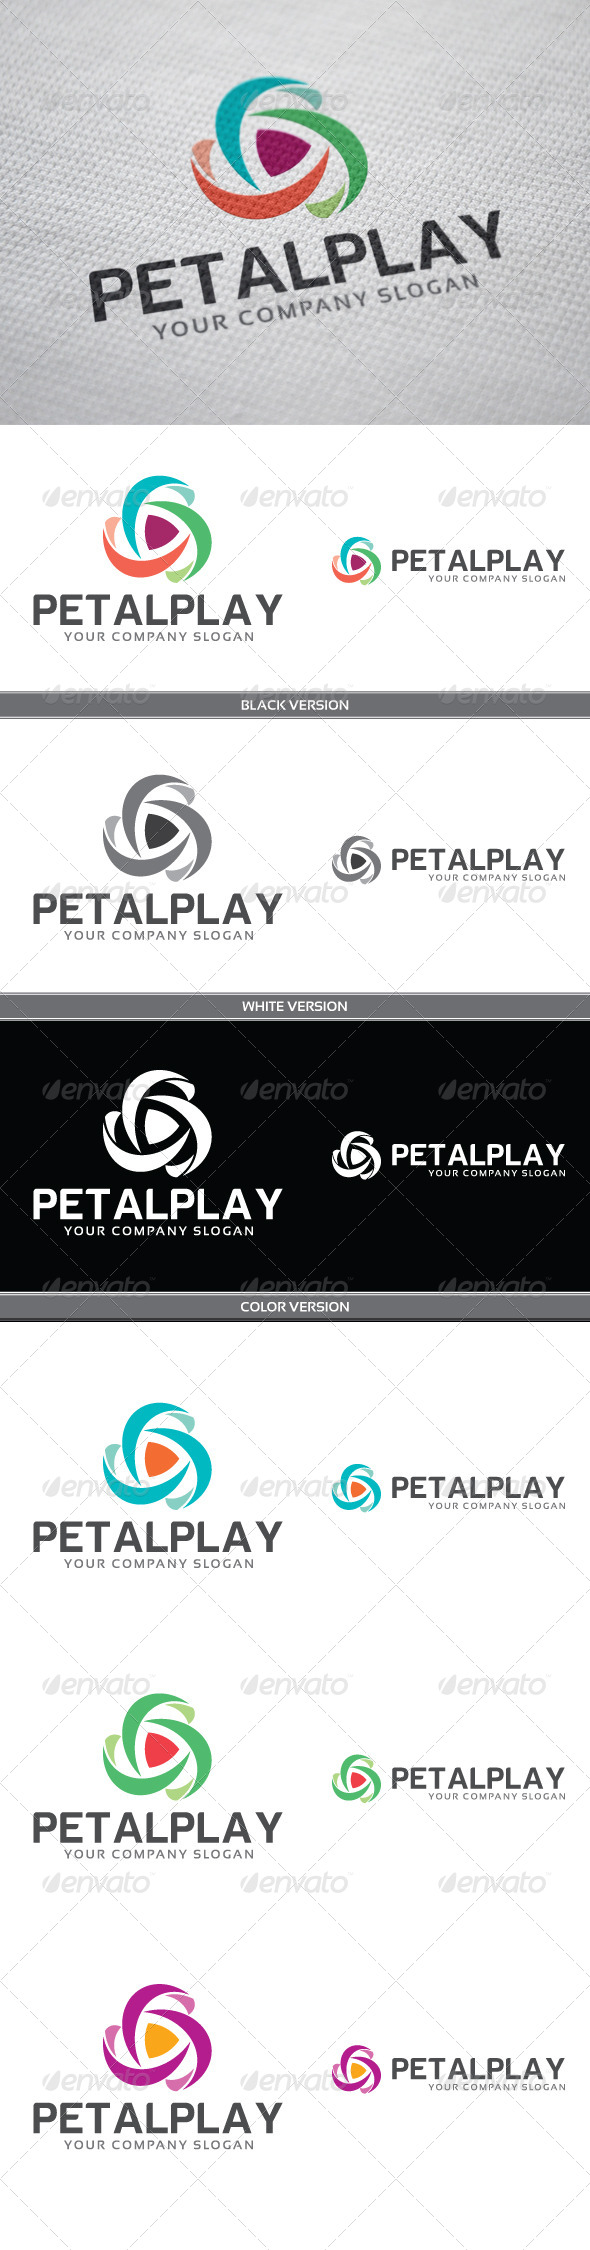 GraphicRiver PetalPlay 4068724